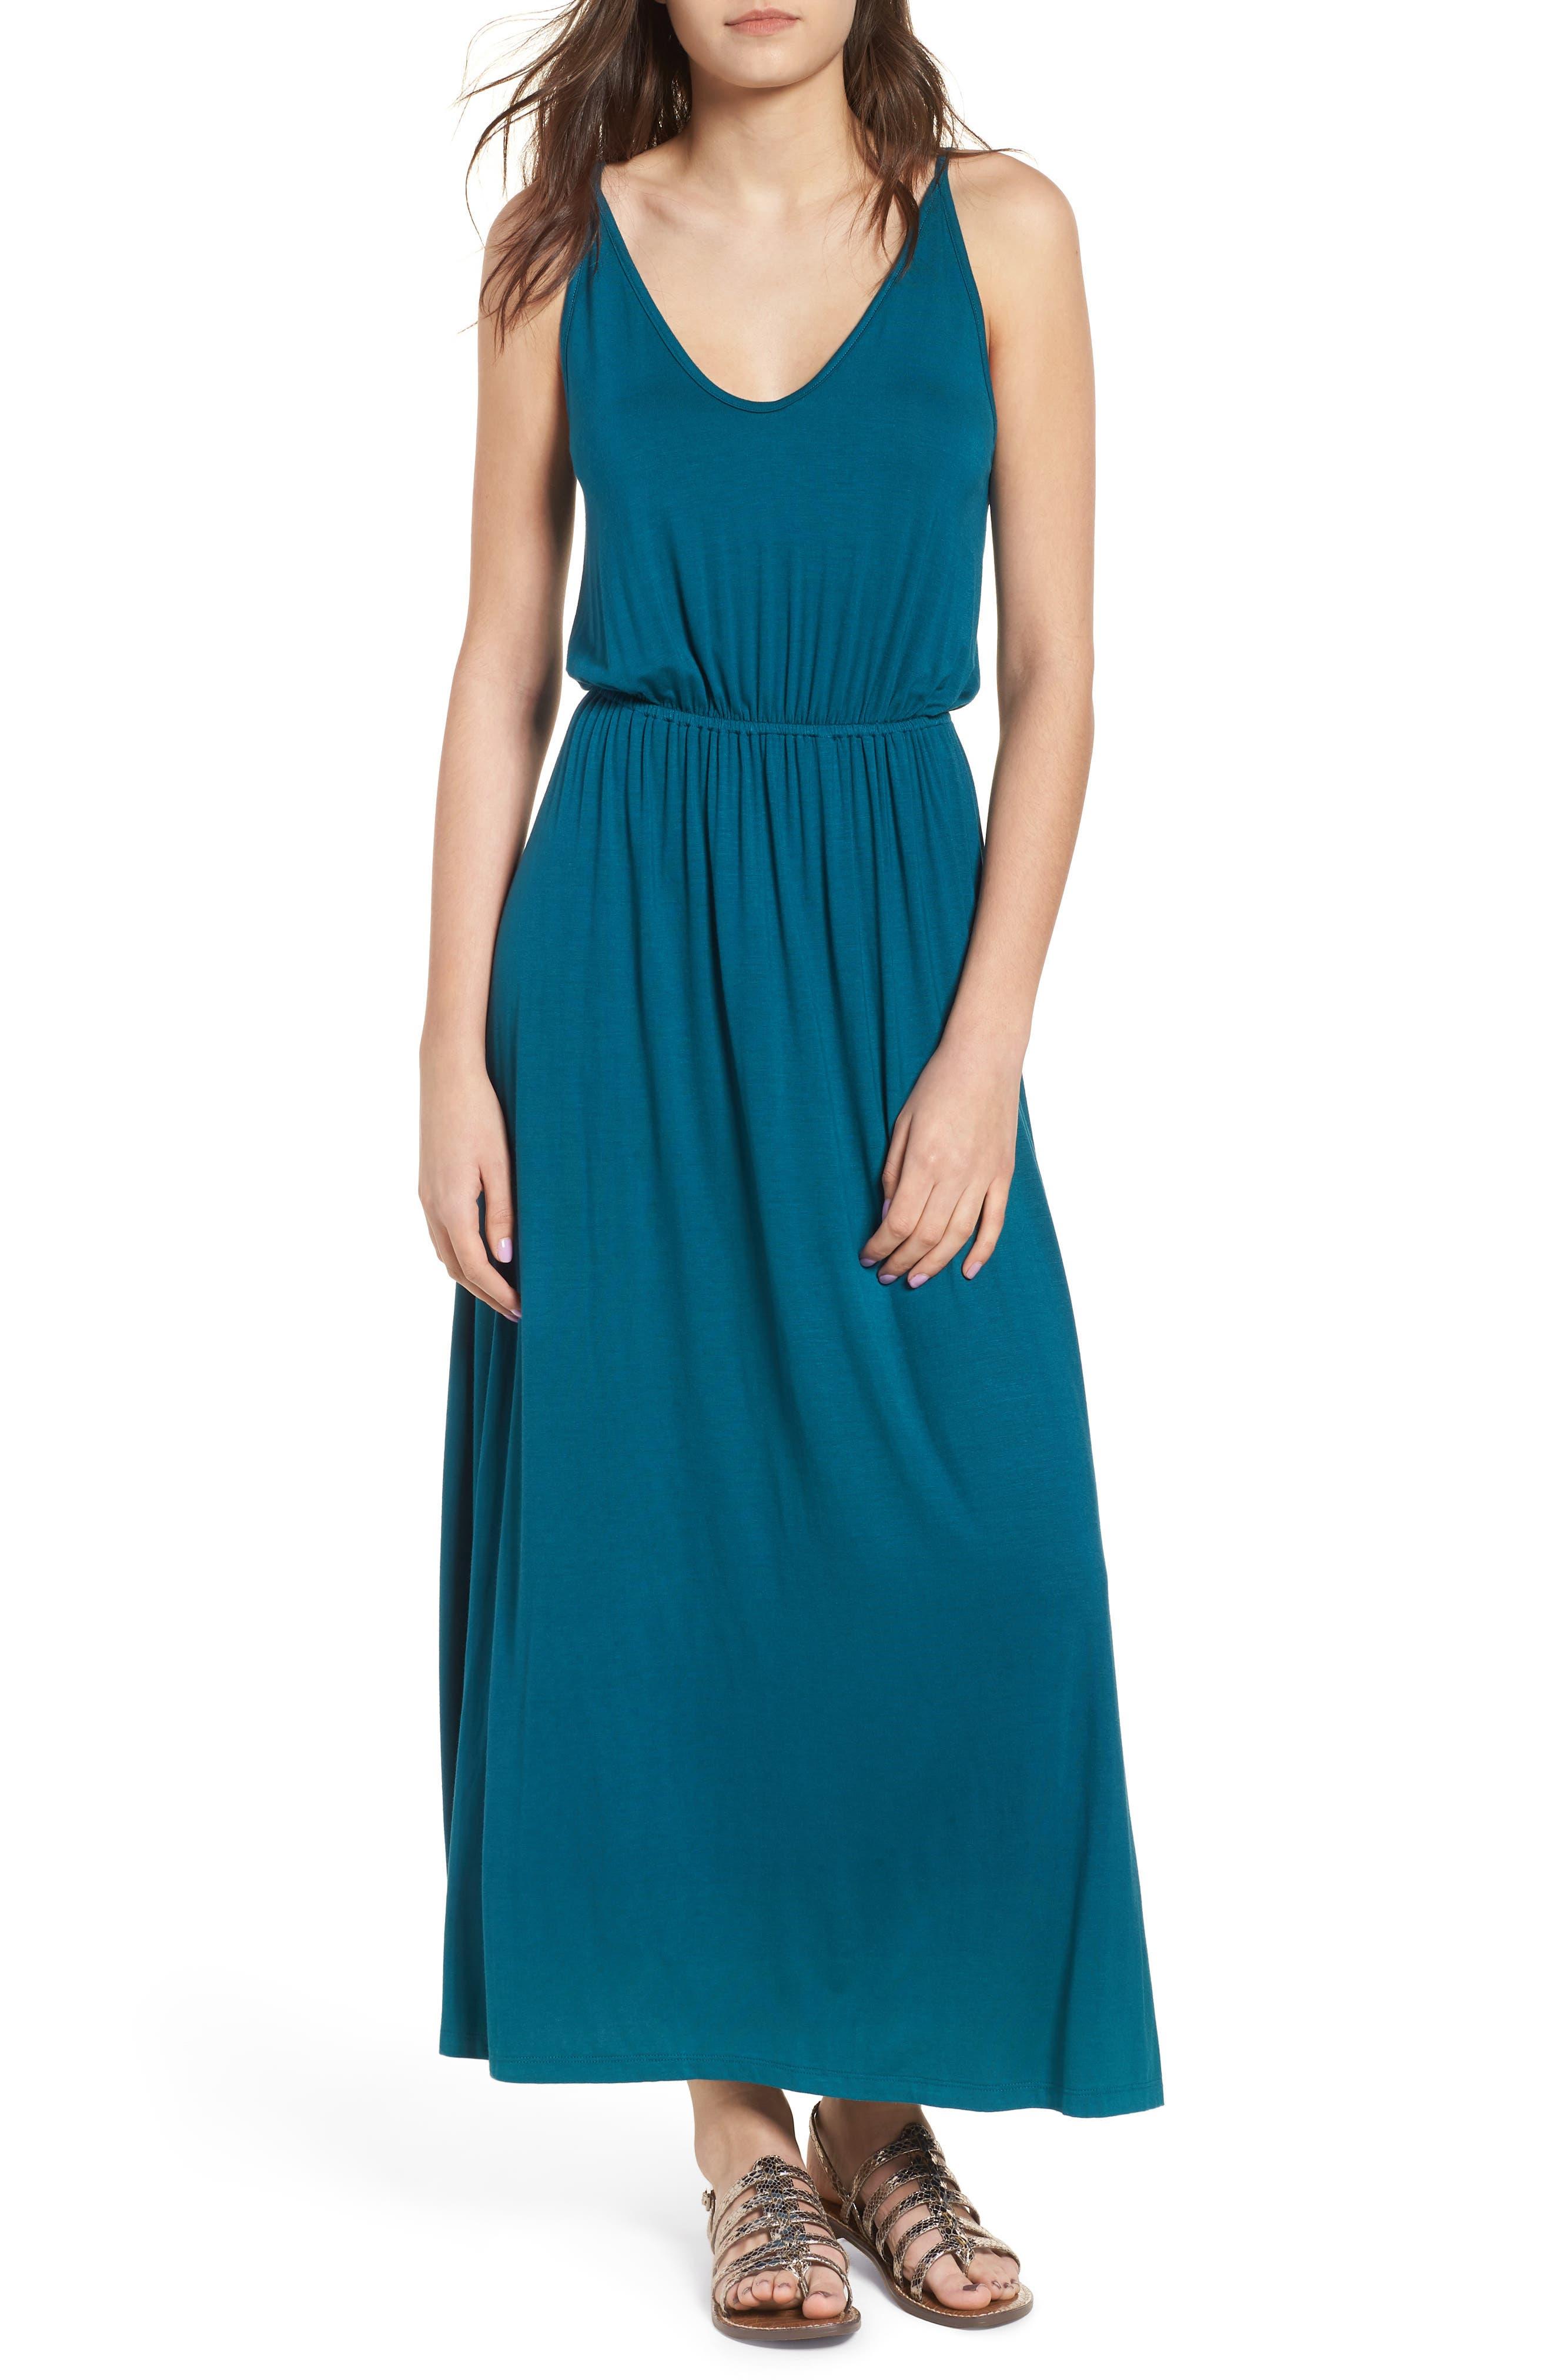 V-Neck Maxi Dress,                             Main thumbnail 1, color,                             Teal Hydro